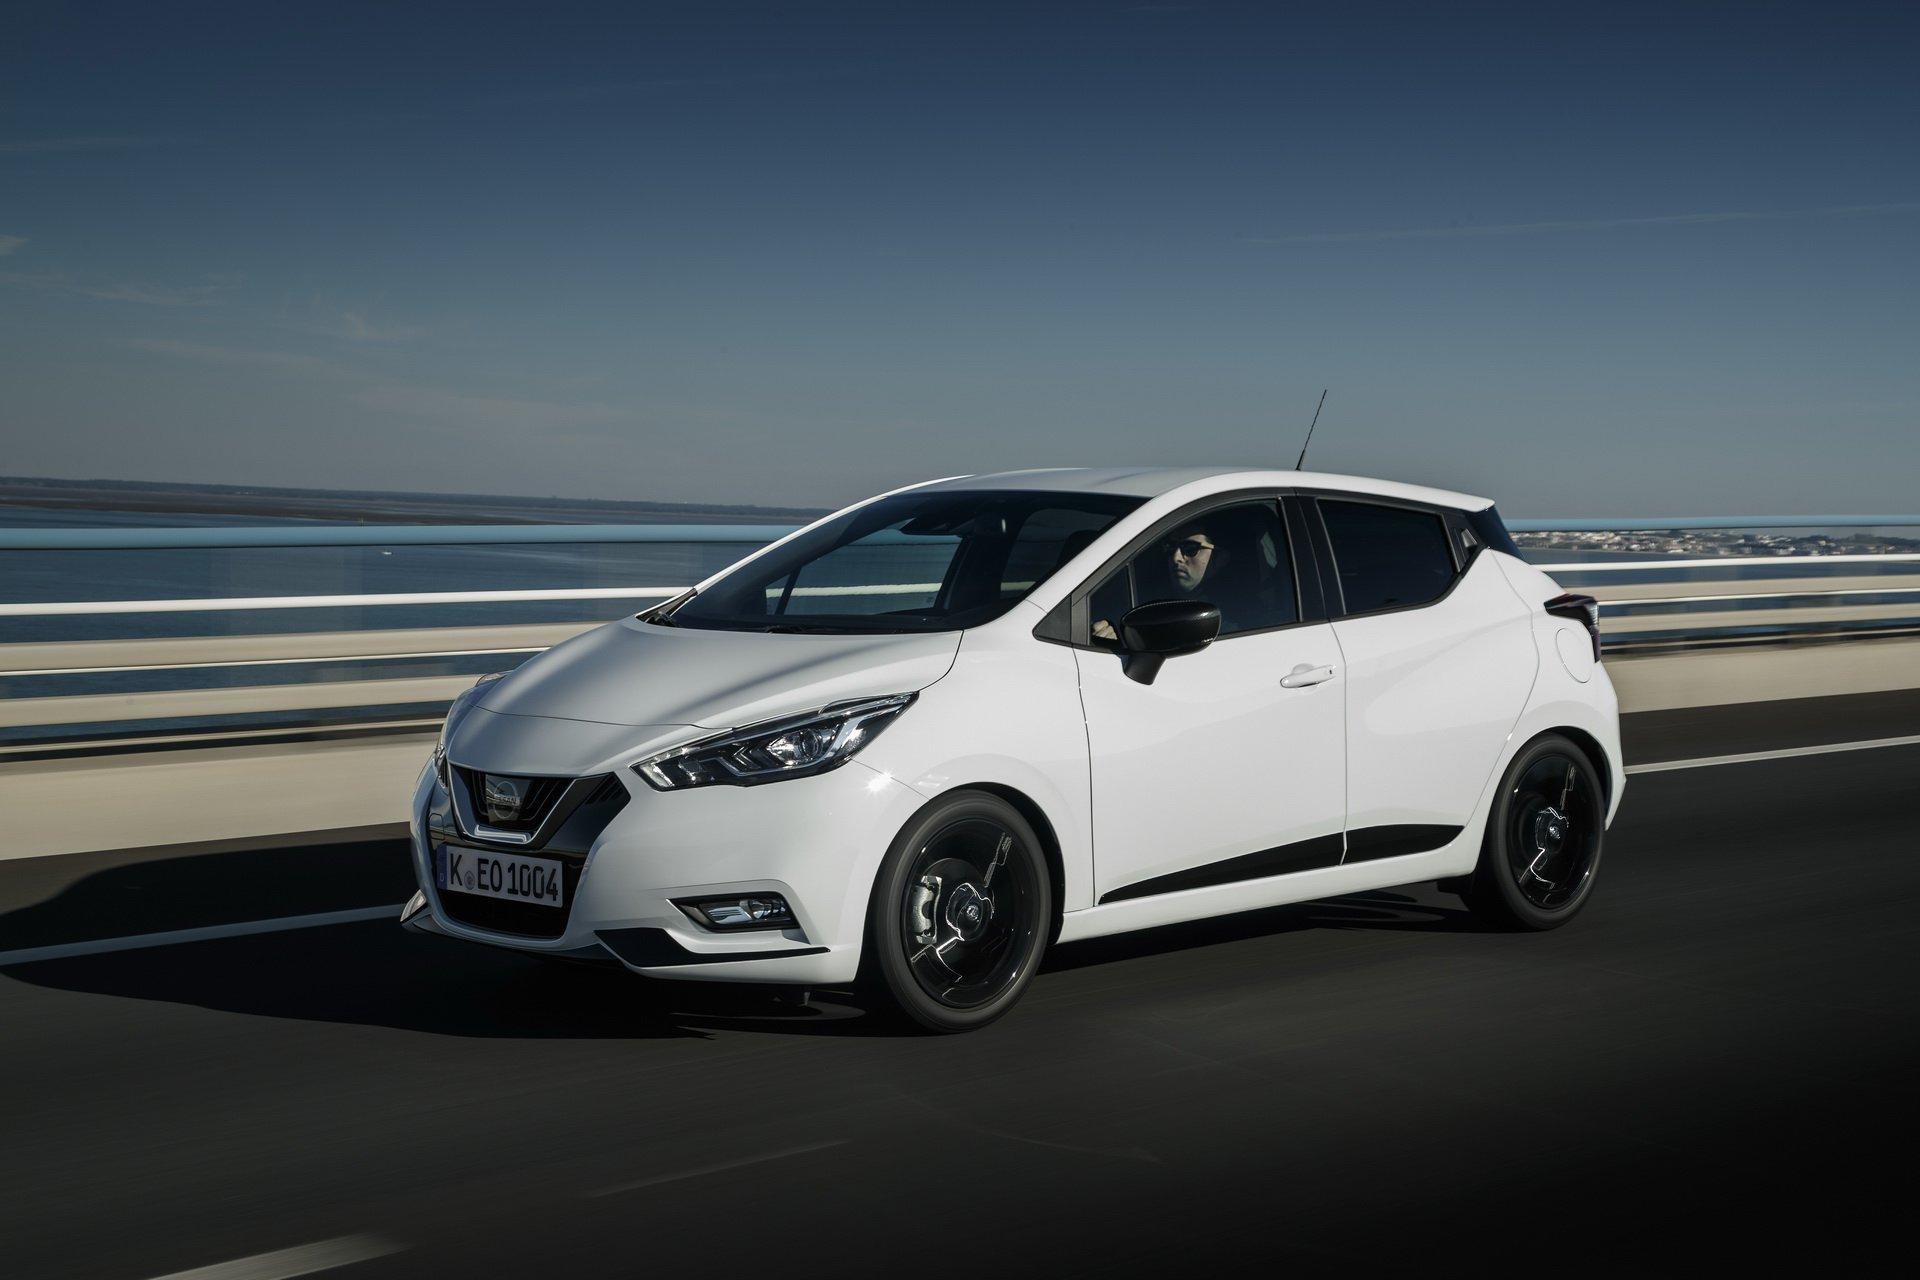 Nissan Micra MY 2019